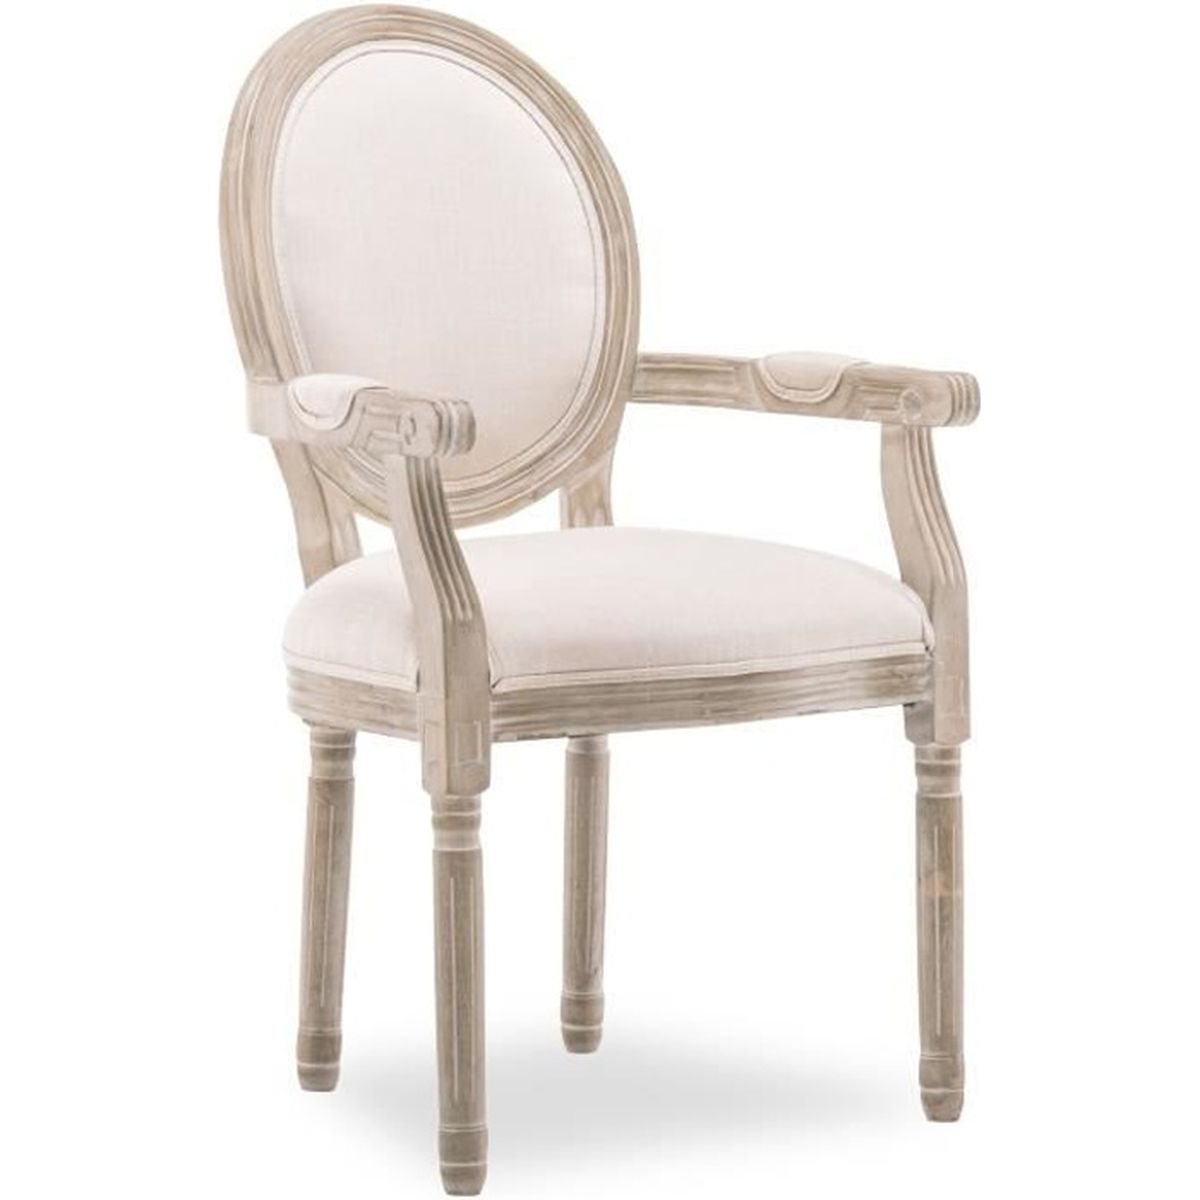 Chaise Salle A Manger Louis Xv chaise medaillon avec accoudoir